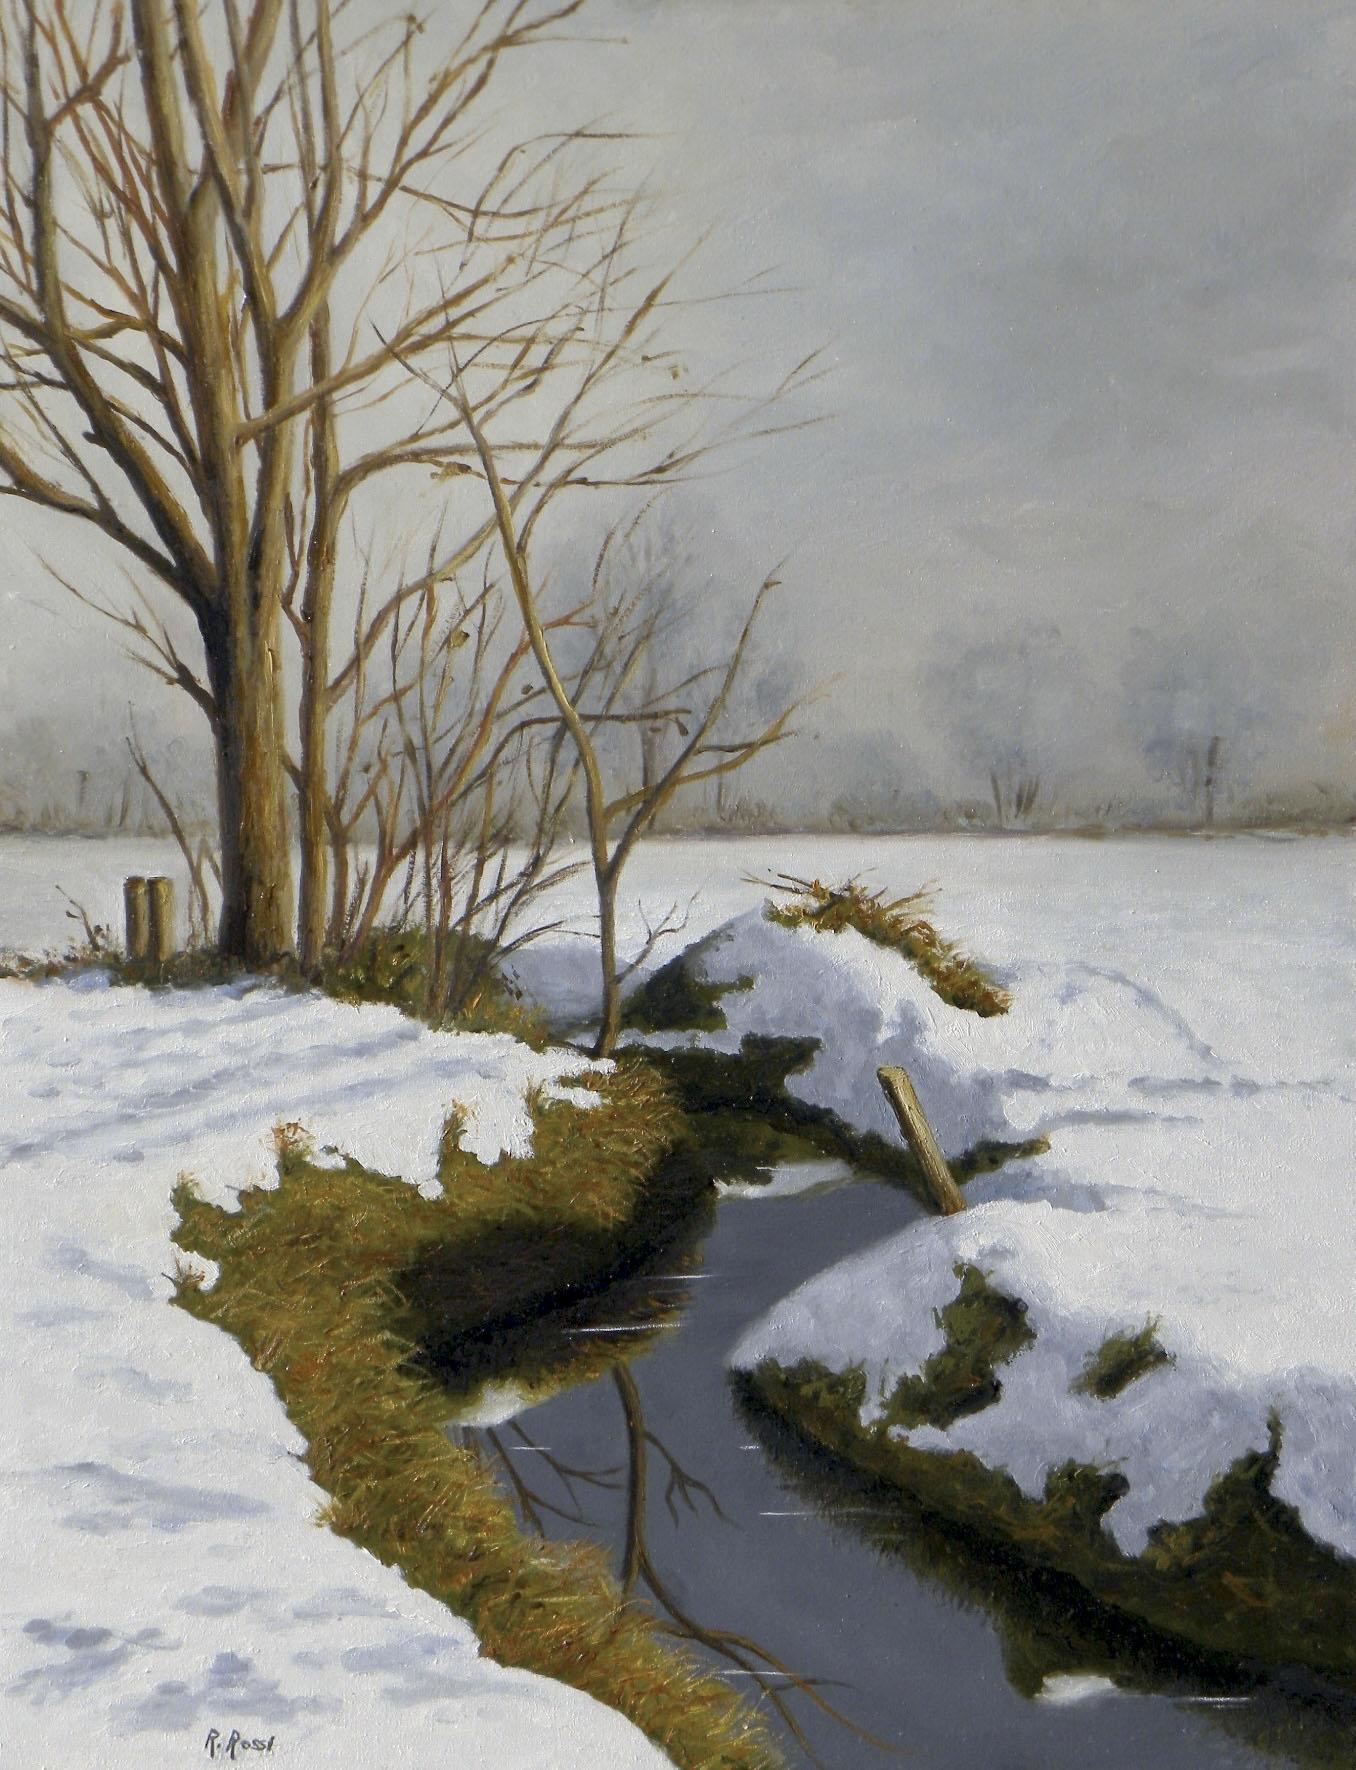 2009 roberta rossi - Dopo la nevicata - olio su tela - 46 x 35